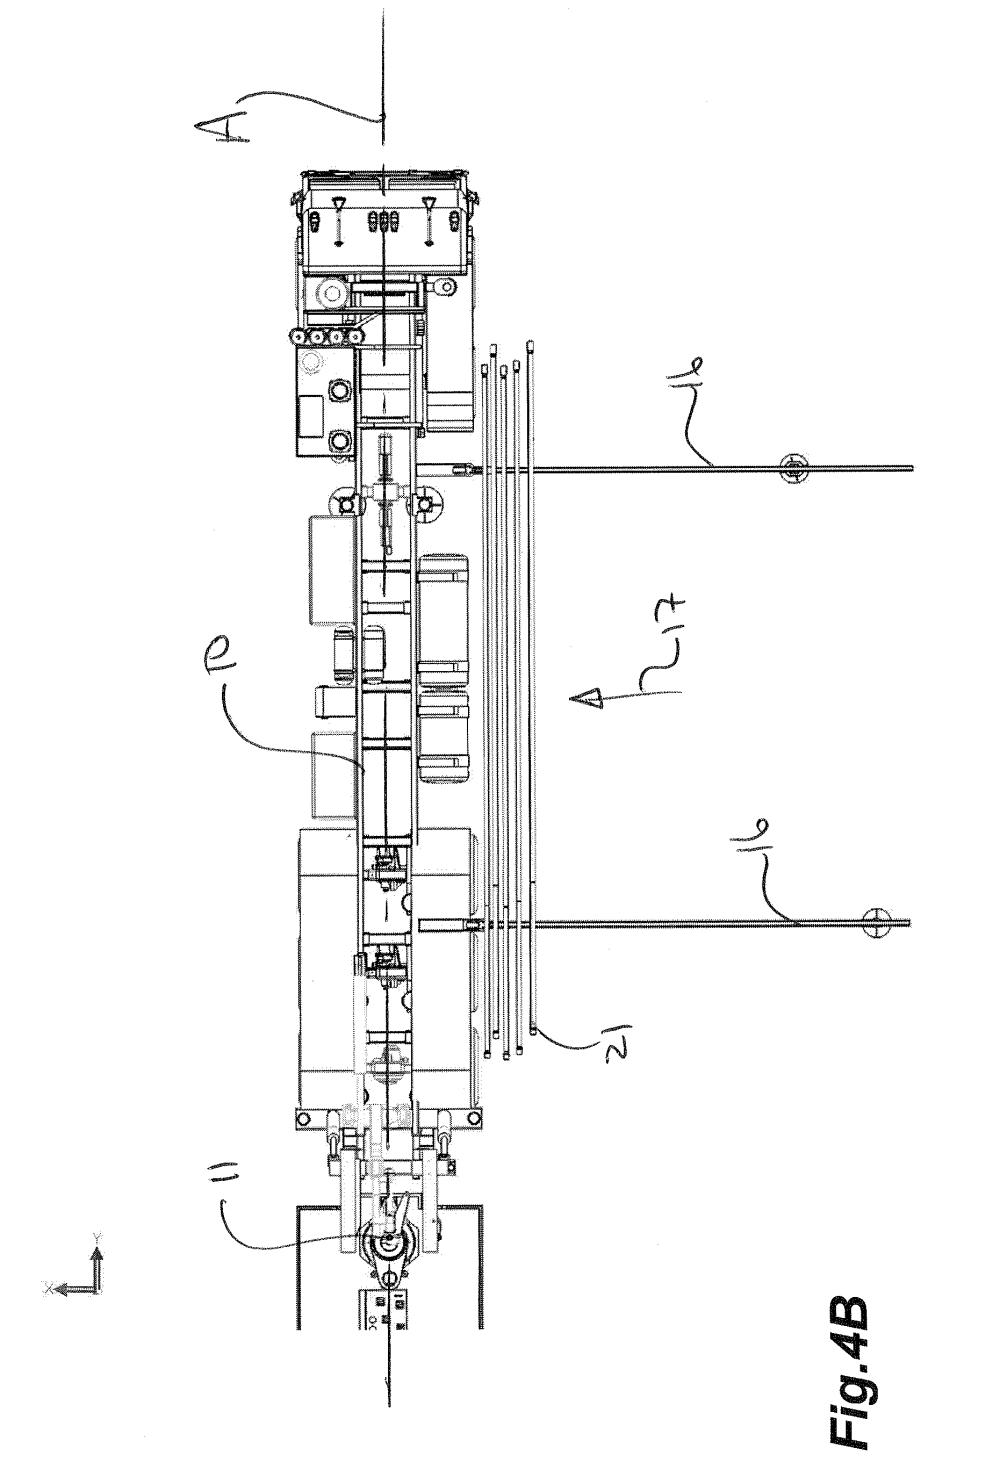 medium resolution of 2 sd motor contactor wiring diagram